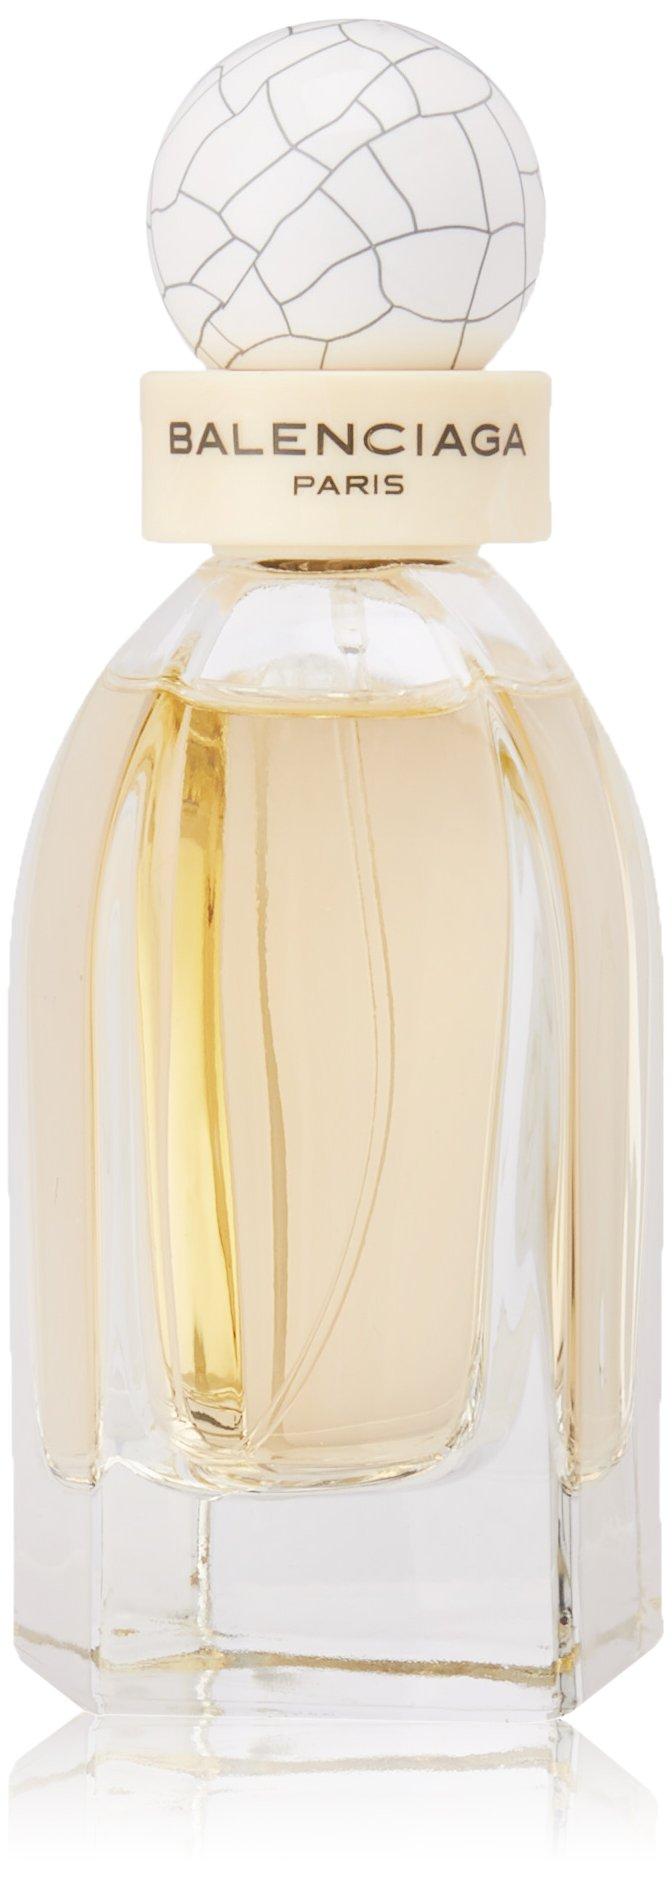 balenciaga paris l 39 essence eau de parfum spray for women 1 7 ounce balenciaga. Black Bedroom Furniture Sets. Home Design Ideas